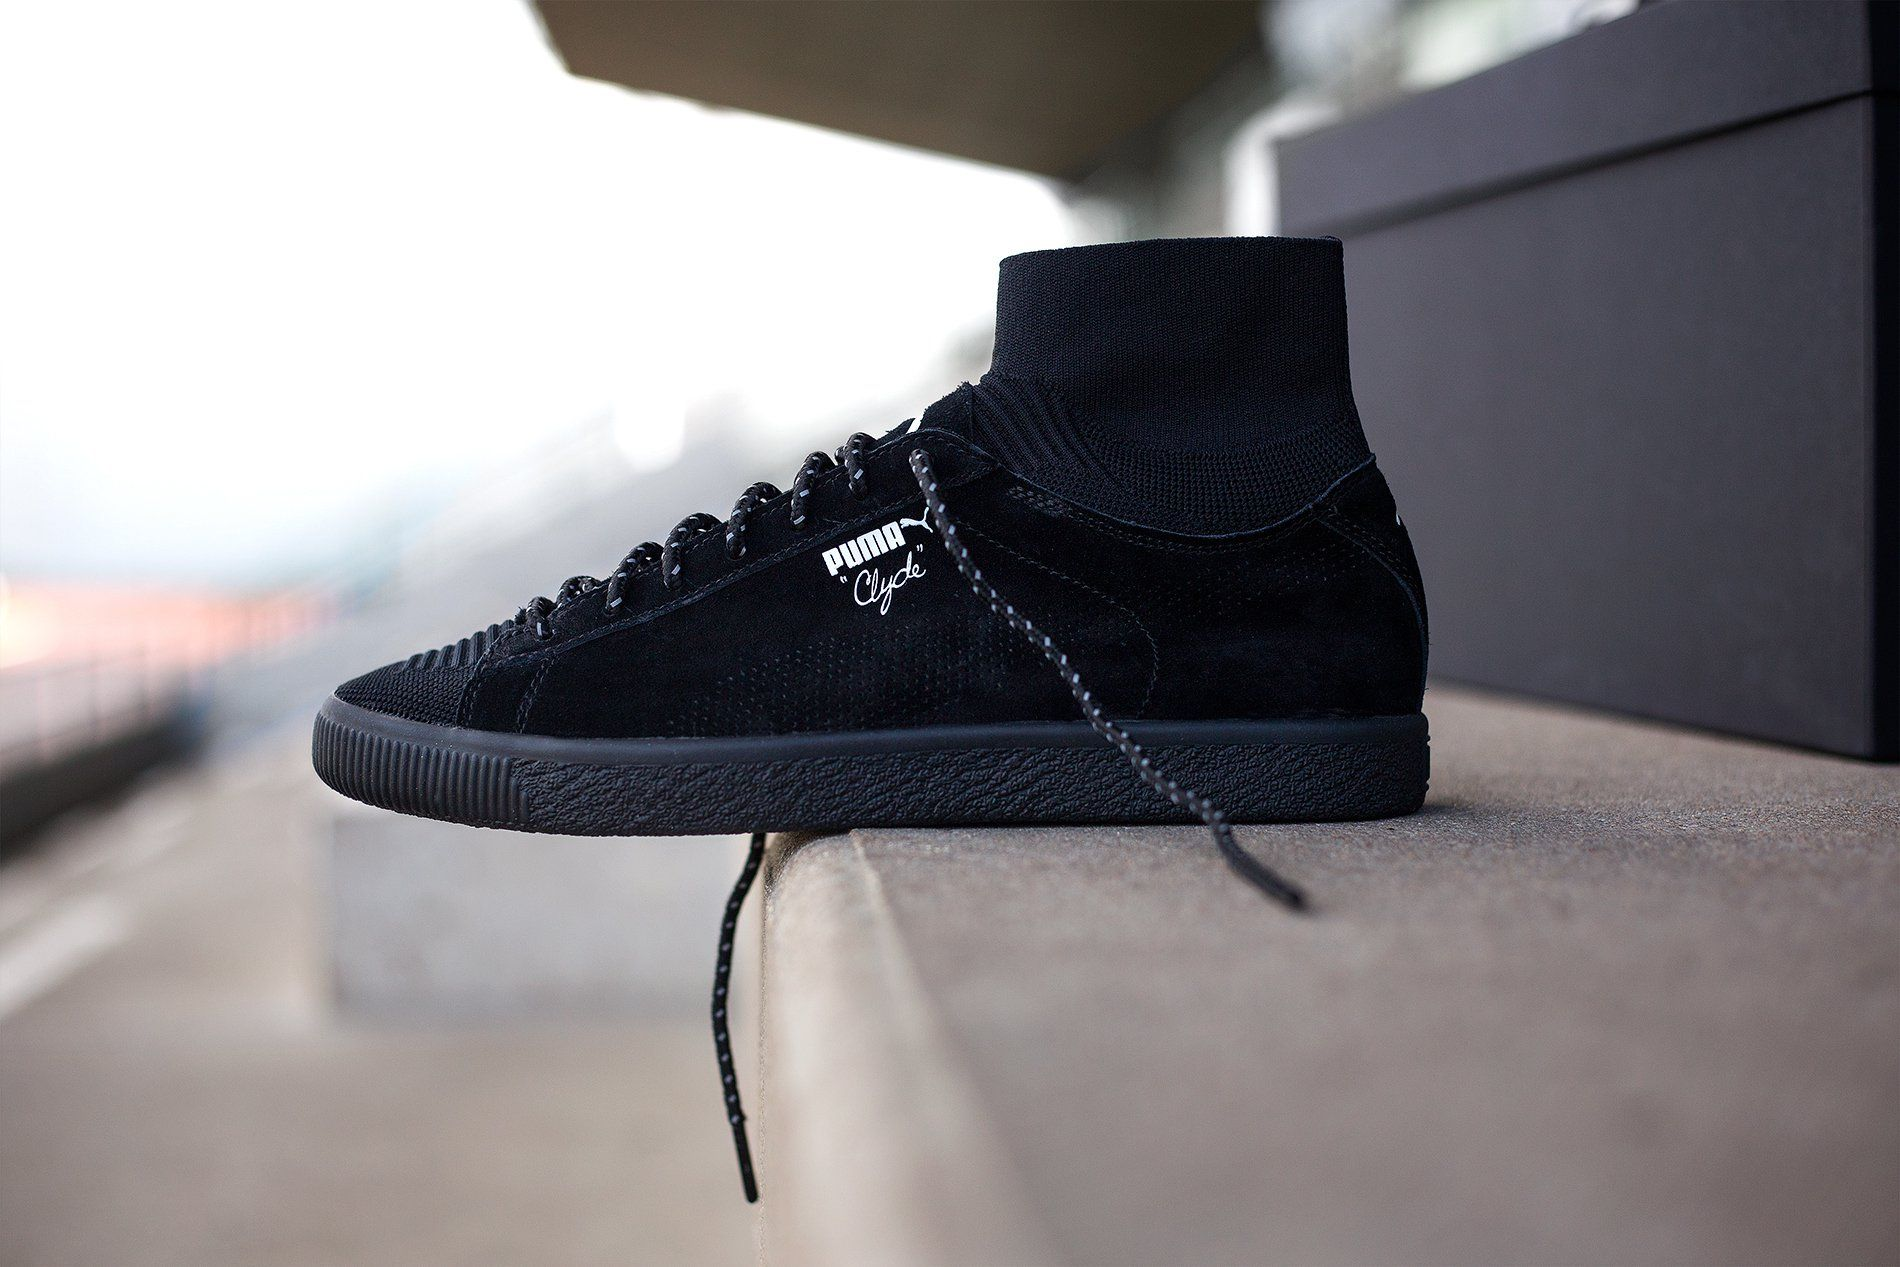 saldar Intolerable siglo  Blackrainbow x Puma Clyde Sock - Special Box | WAVE® | All black sneakers,  Black sneaker, Sneakers